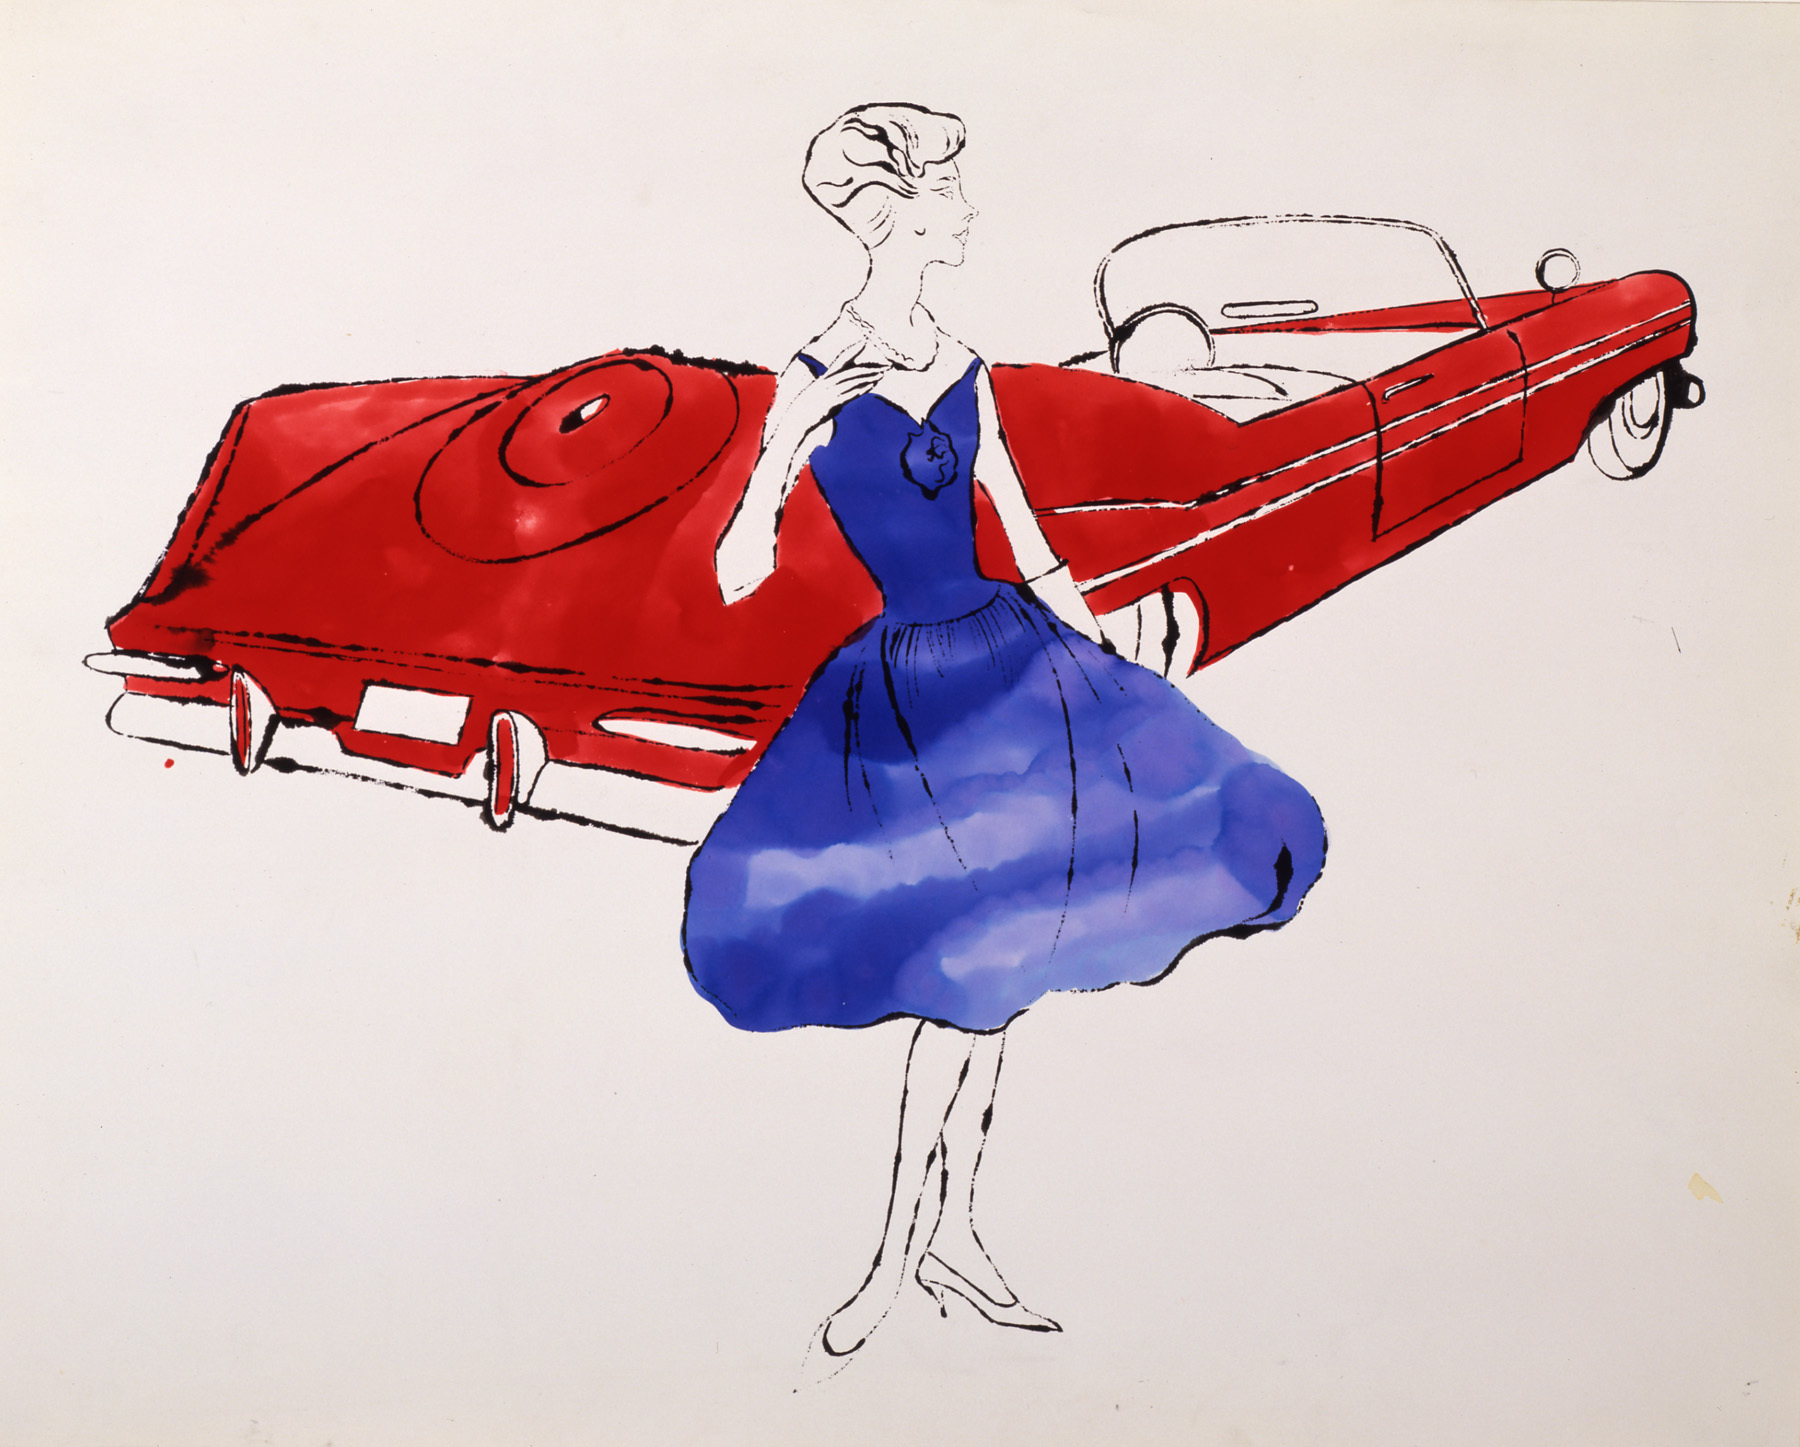 Andy warhol fashion illustration 23